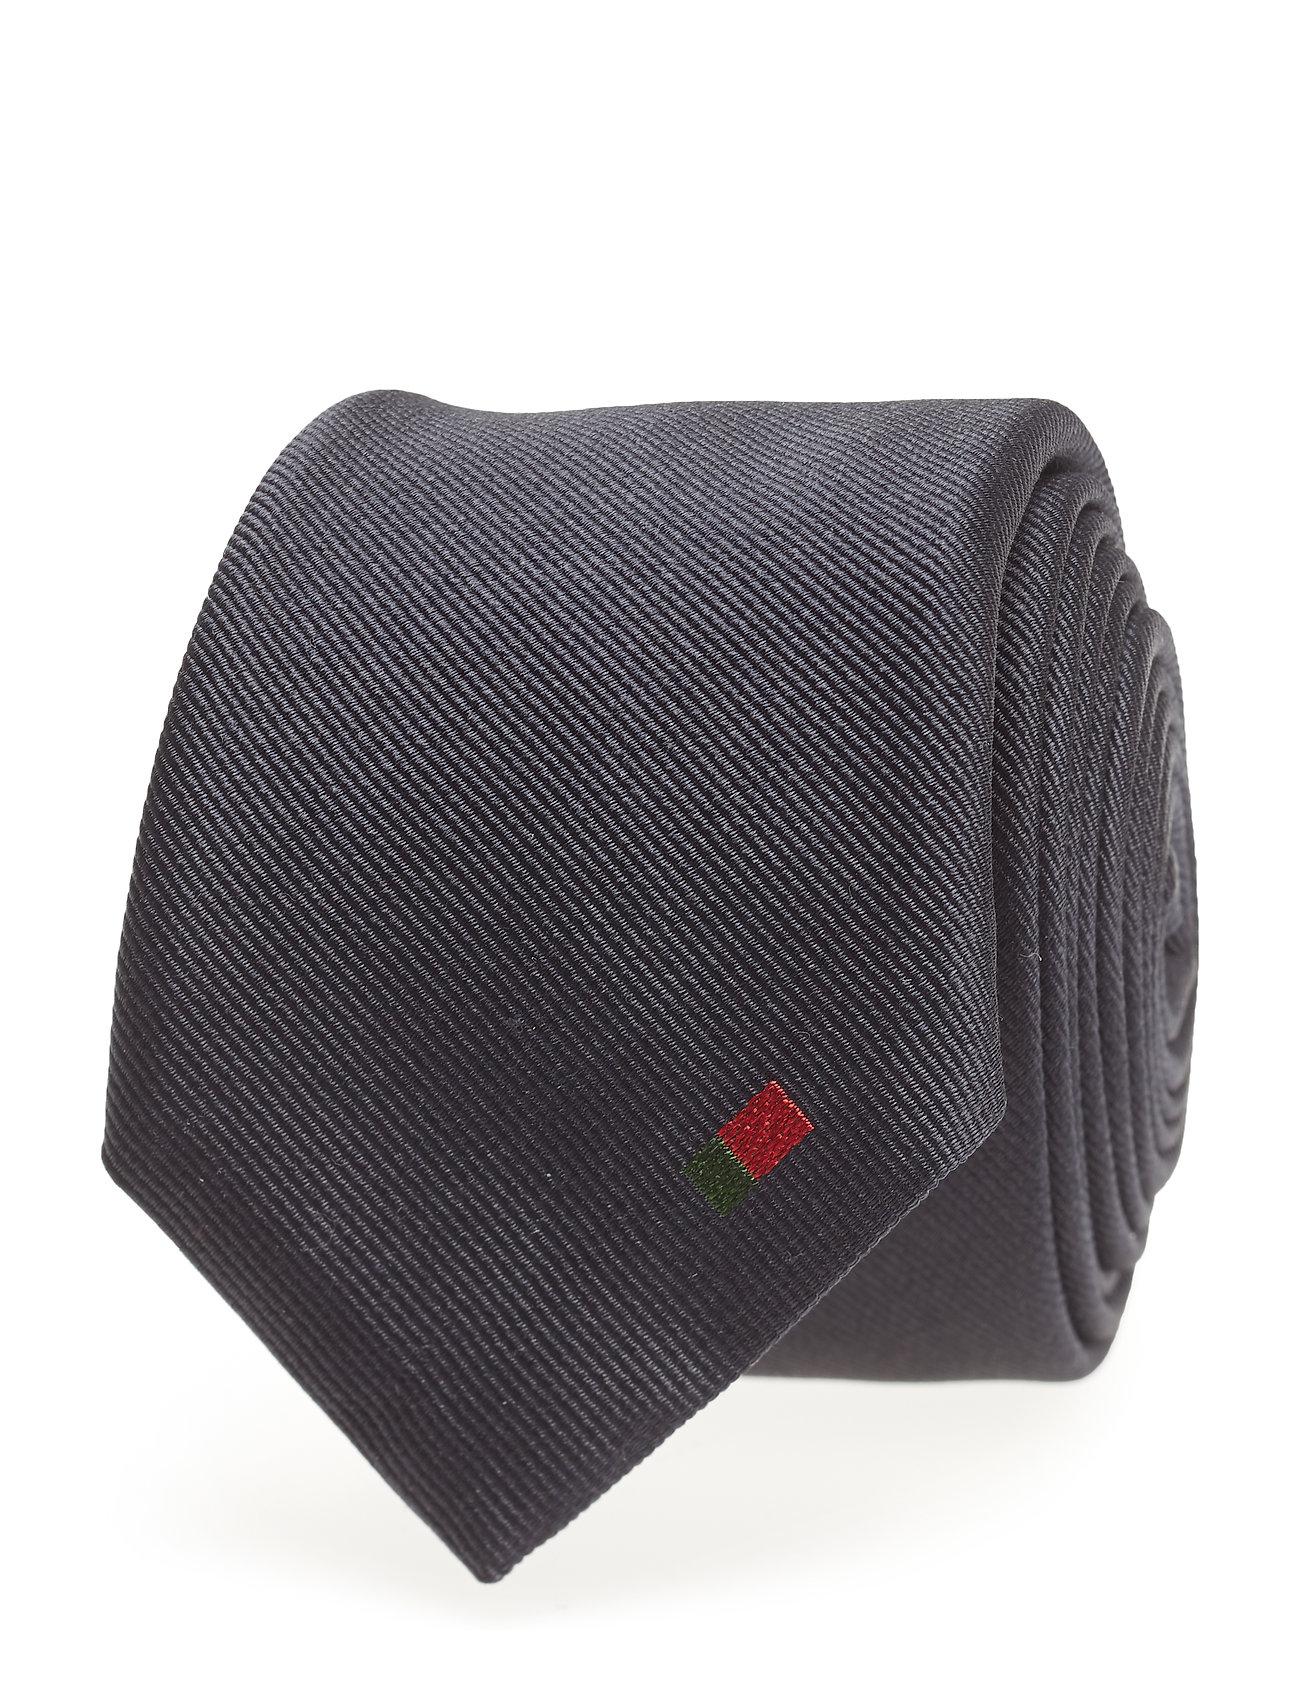 Image of Tie 6 Cm Slips Blå BOSS Business Wear (3333155129)